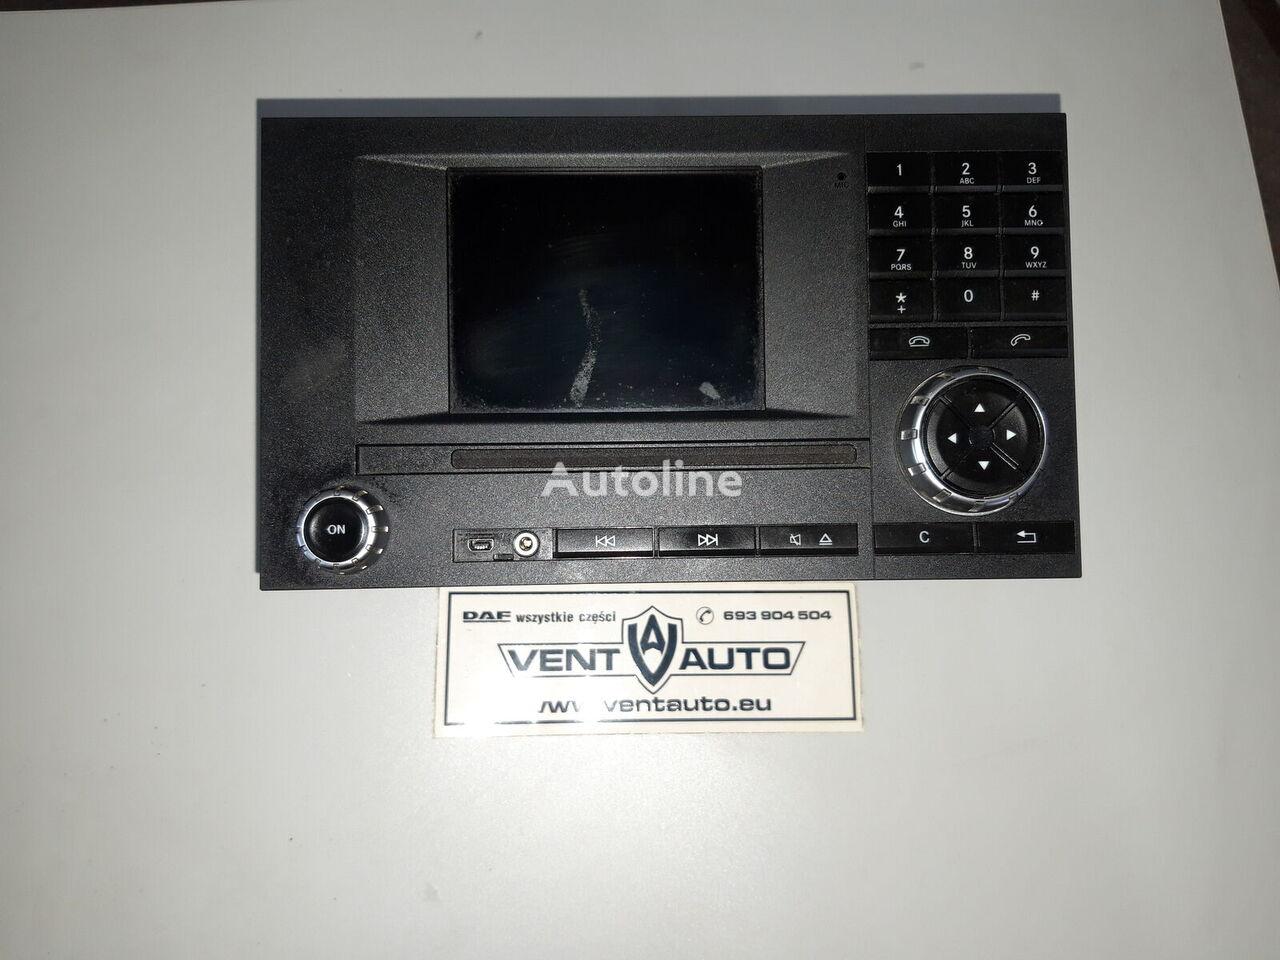 MERCEDES-BENZ ACTROS MP4 NAVIGATION RADIO navigation system for MERCEDES-BENZ ACTROS MP4 tractor unit